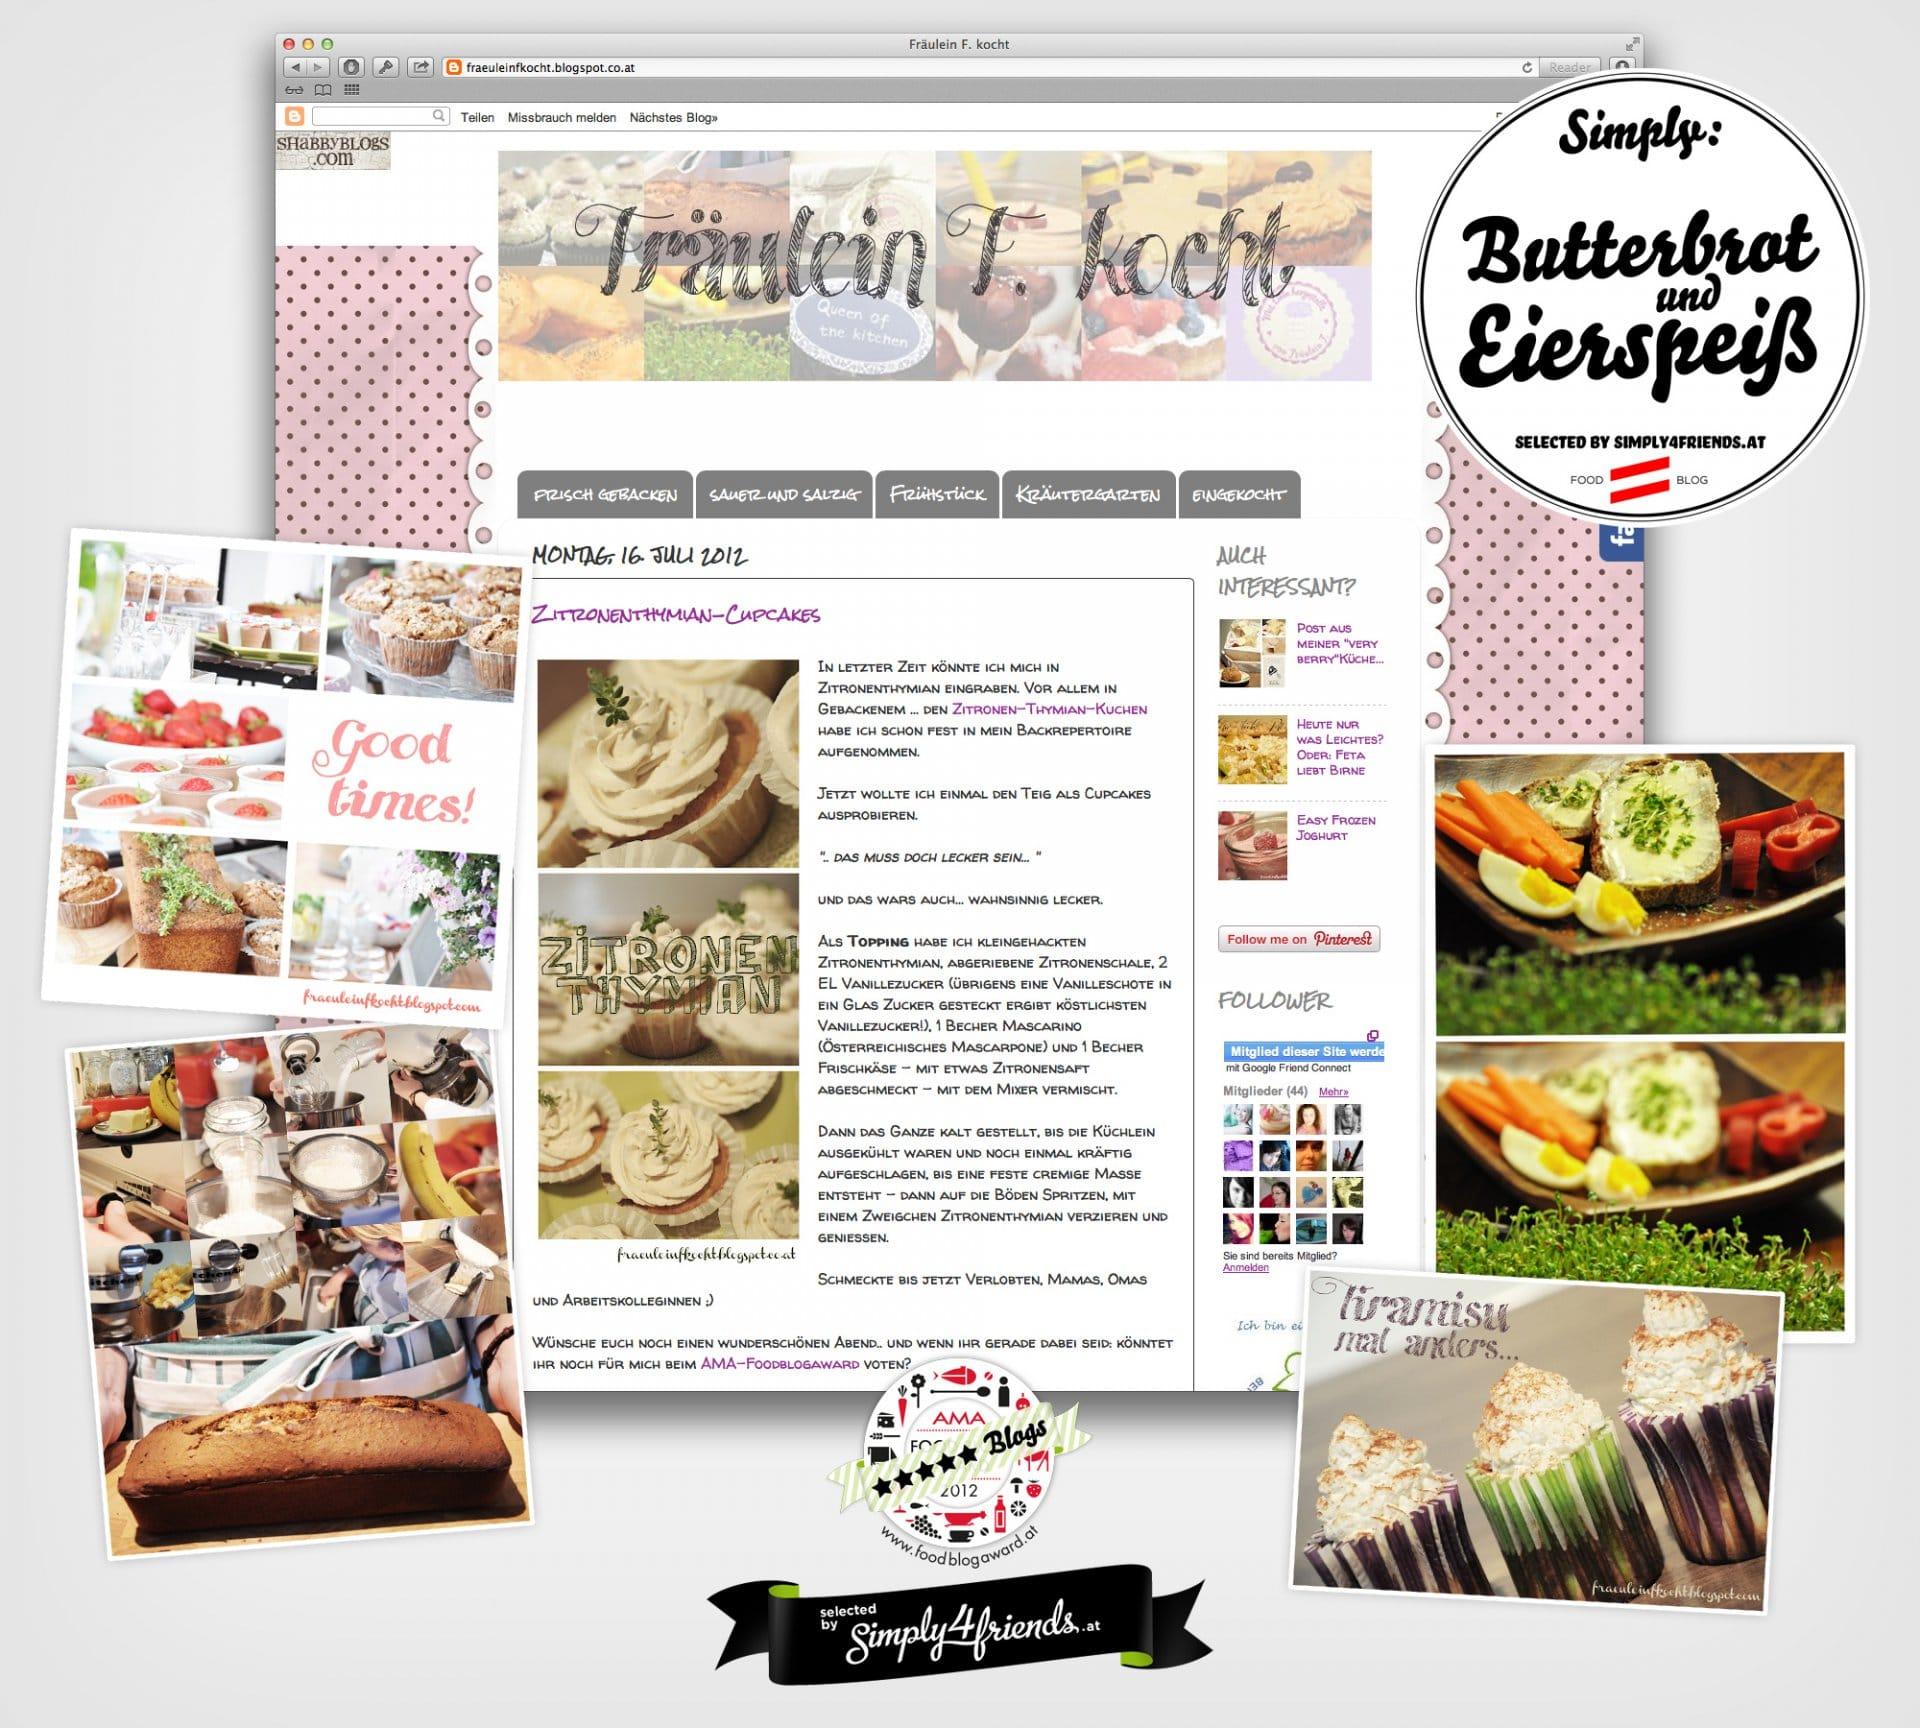 2012 topfoodblog at fraeuleinfkocht